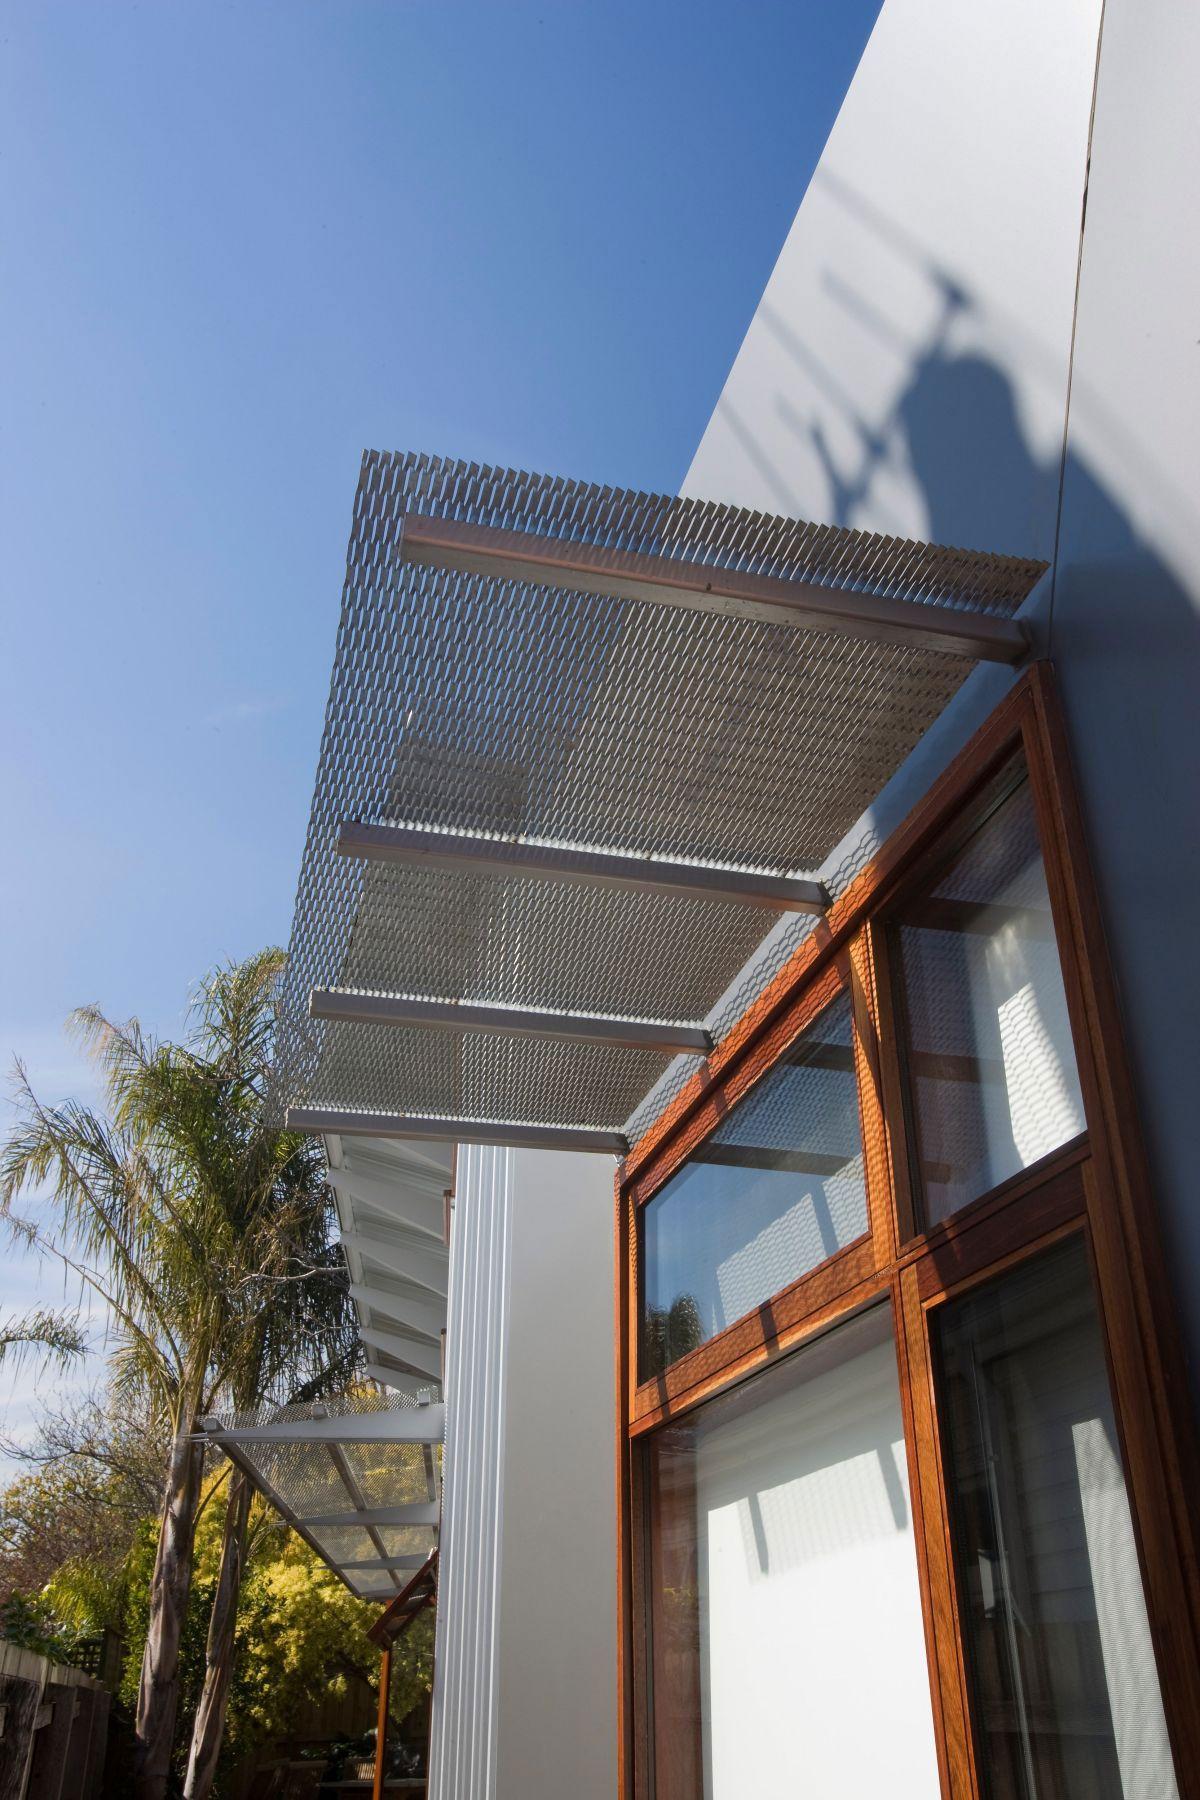 Iron Pergola Above Wood Framed Glass Windows Orrong Road